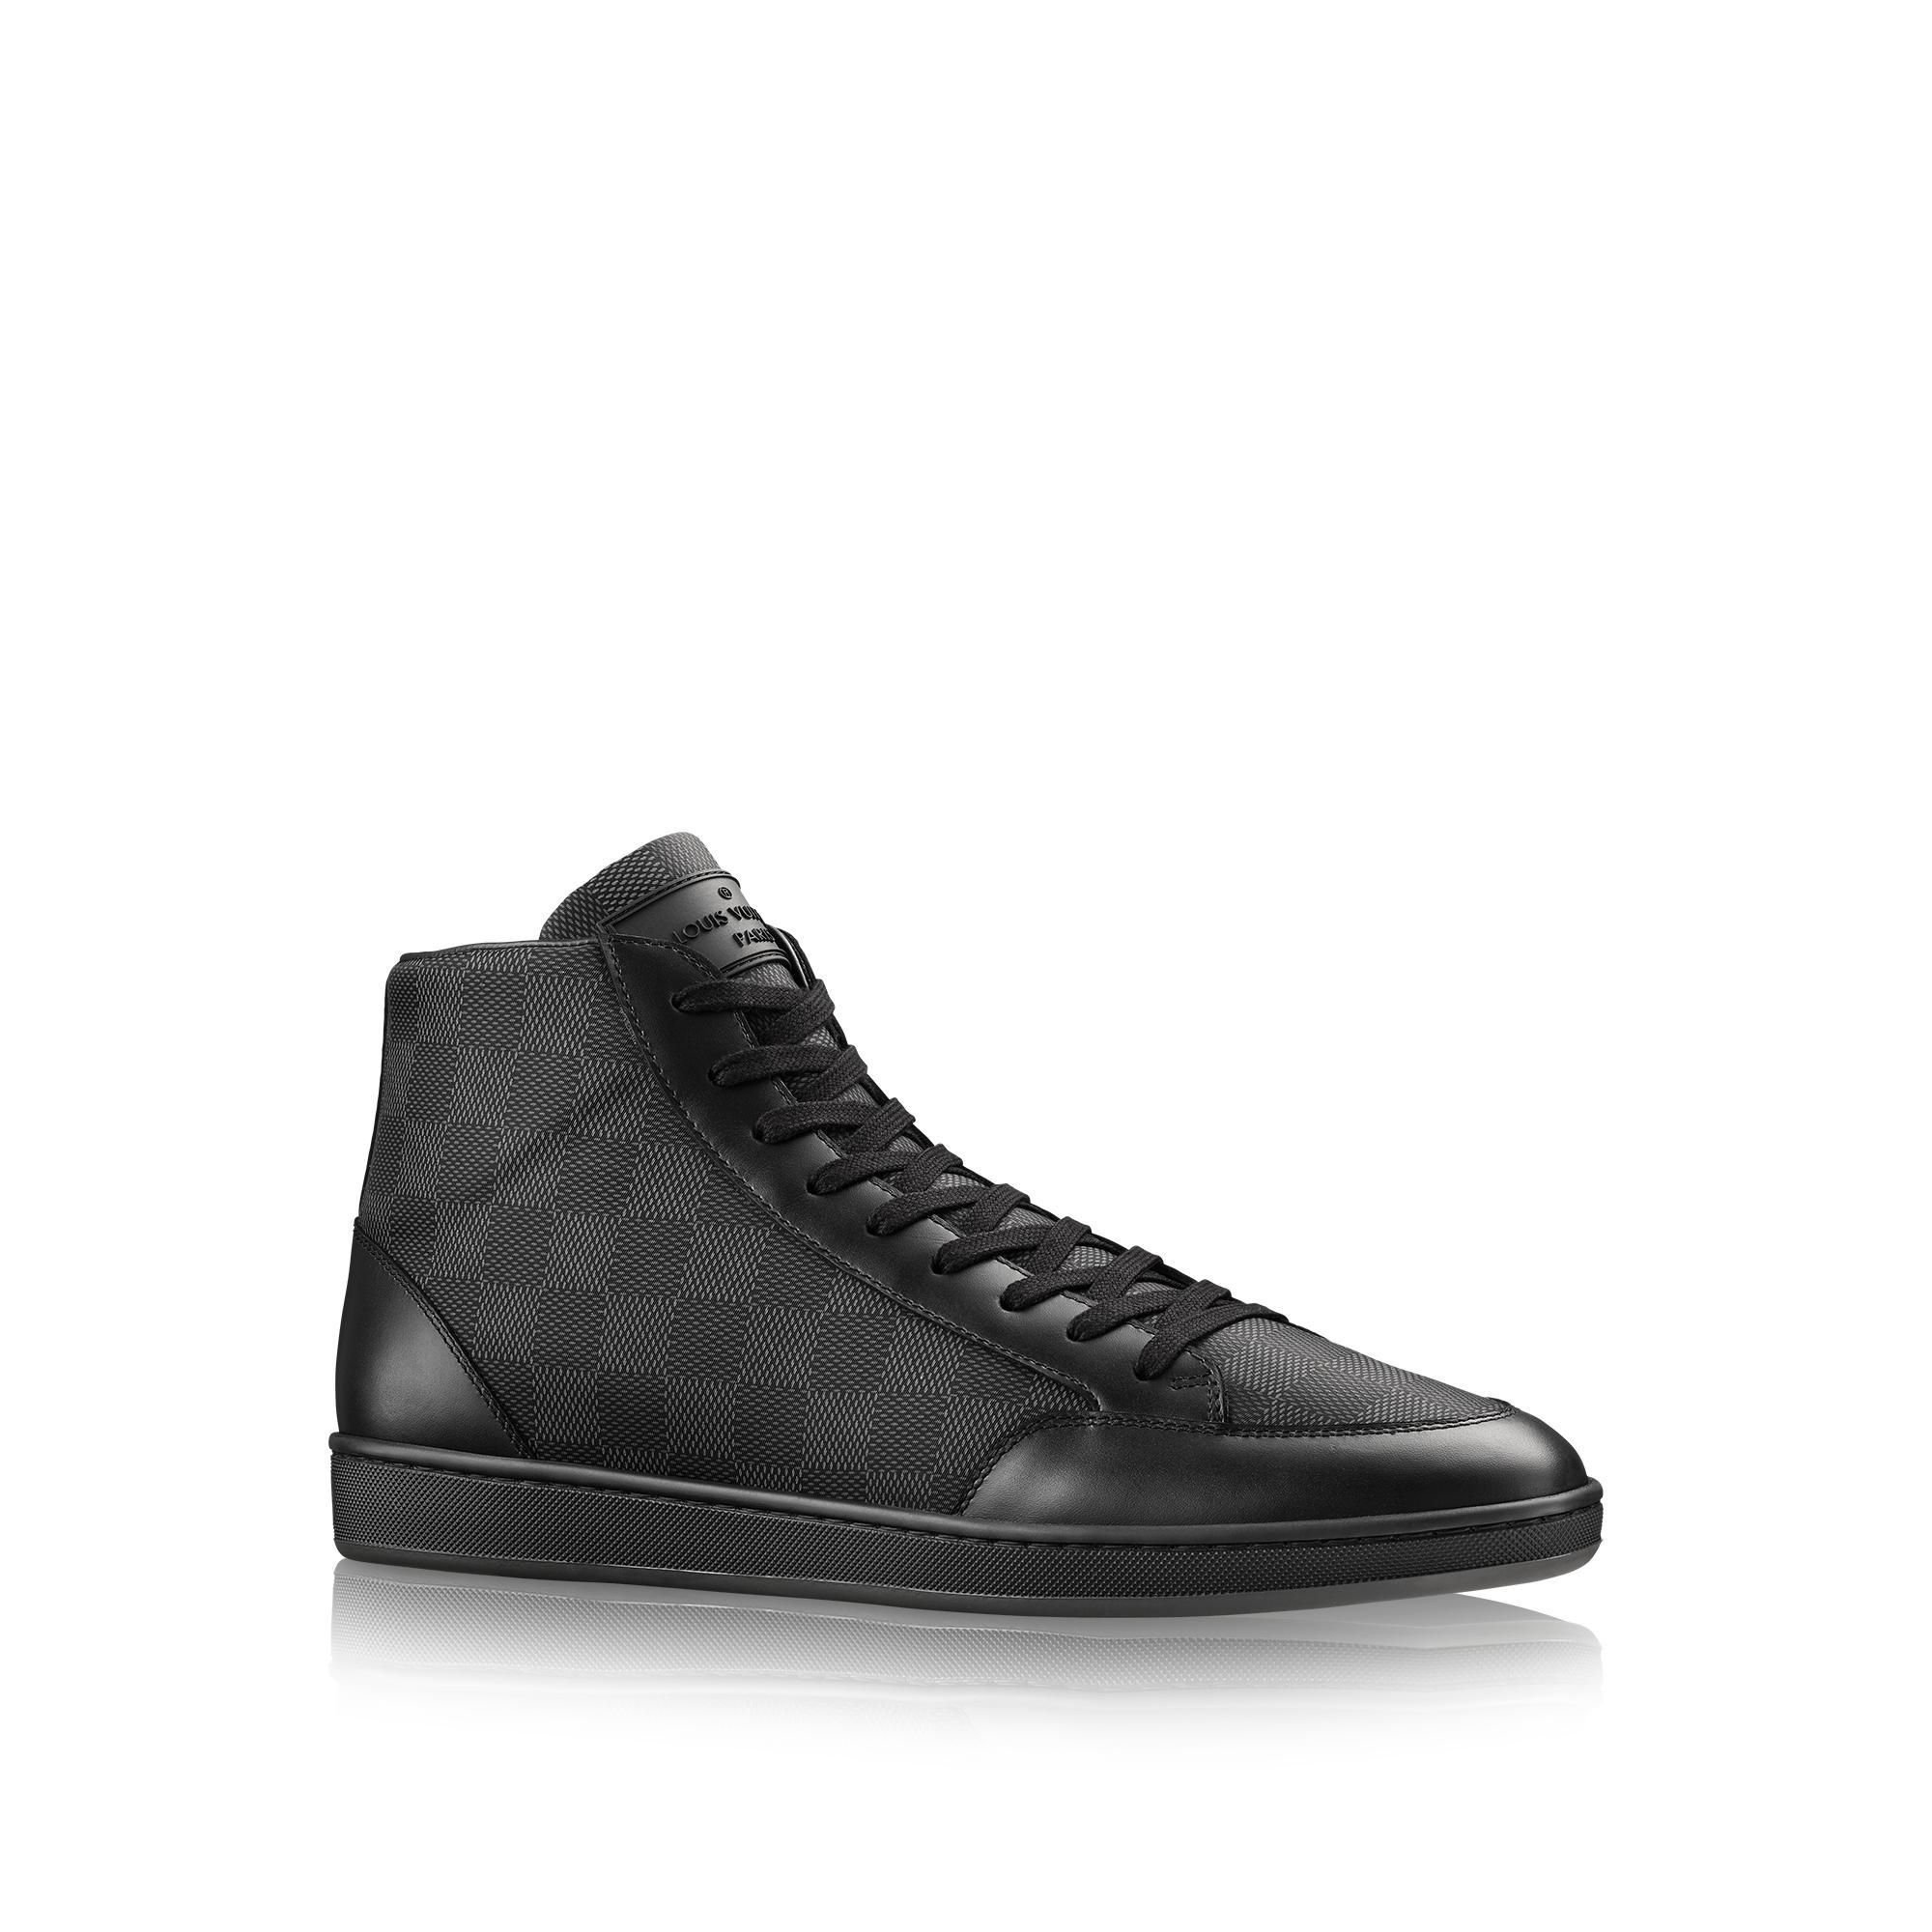 louis vuitton high top sneakers